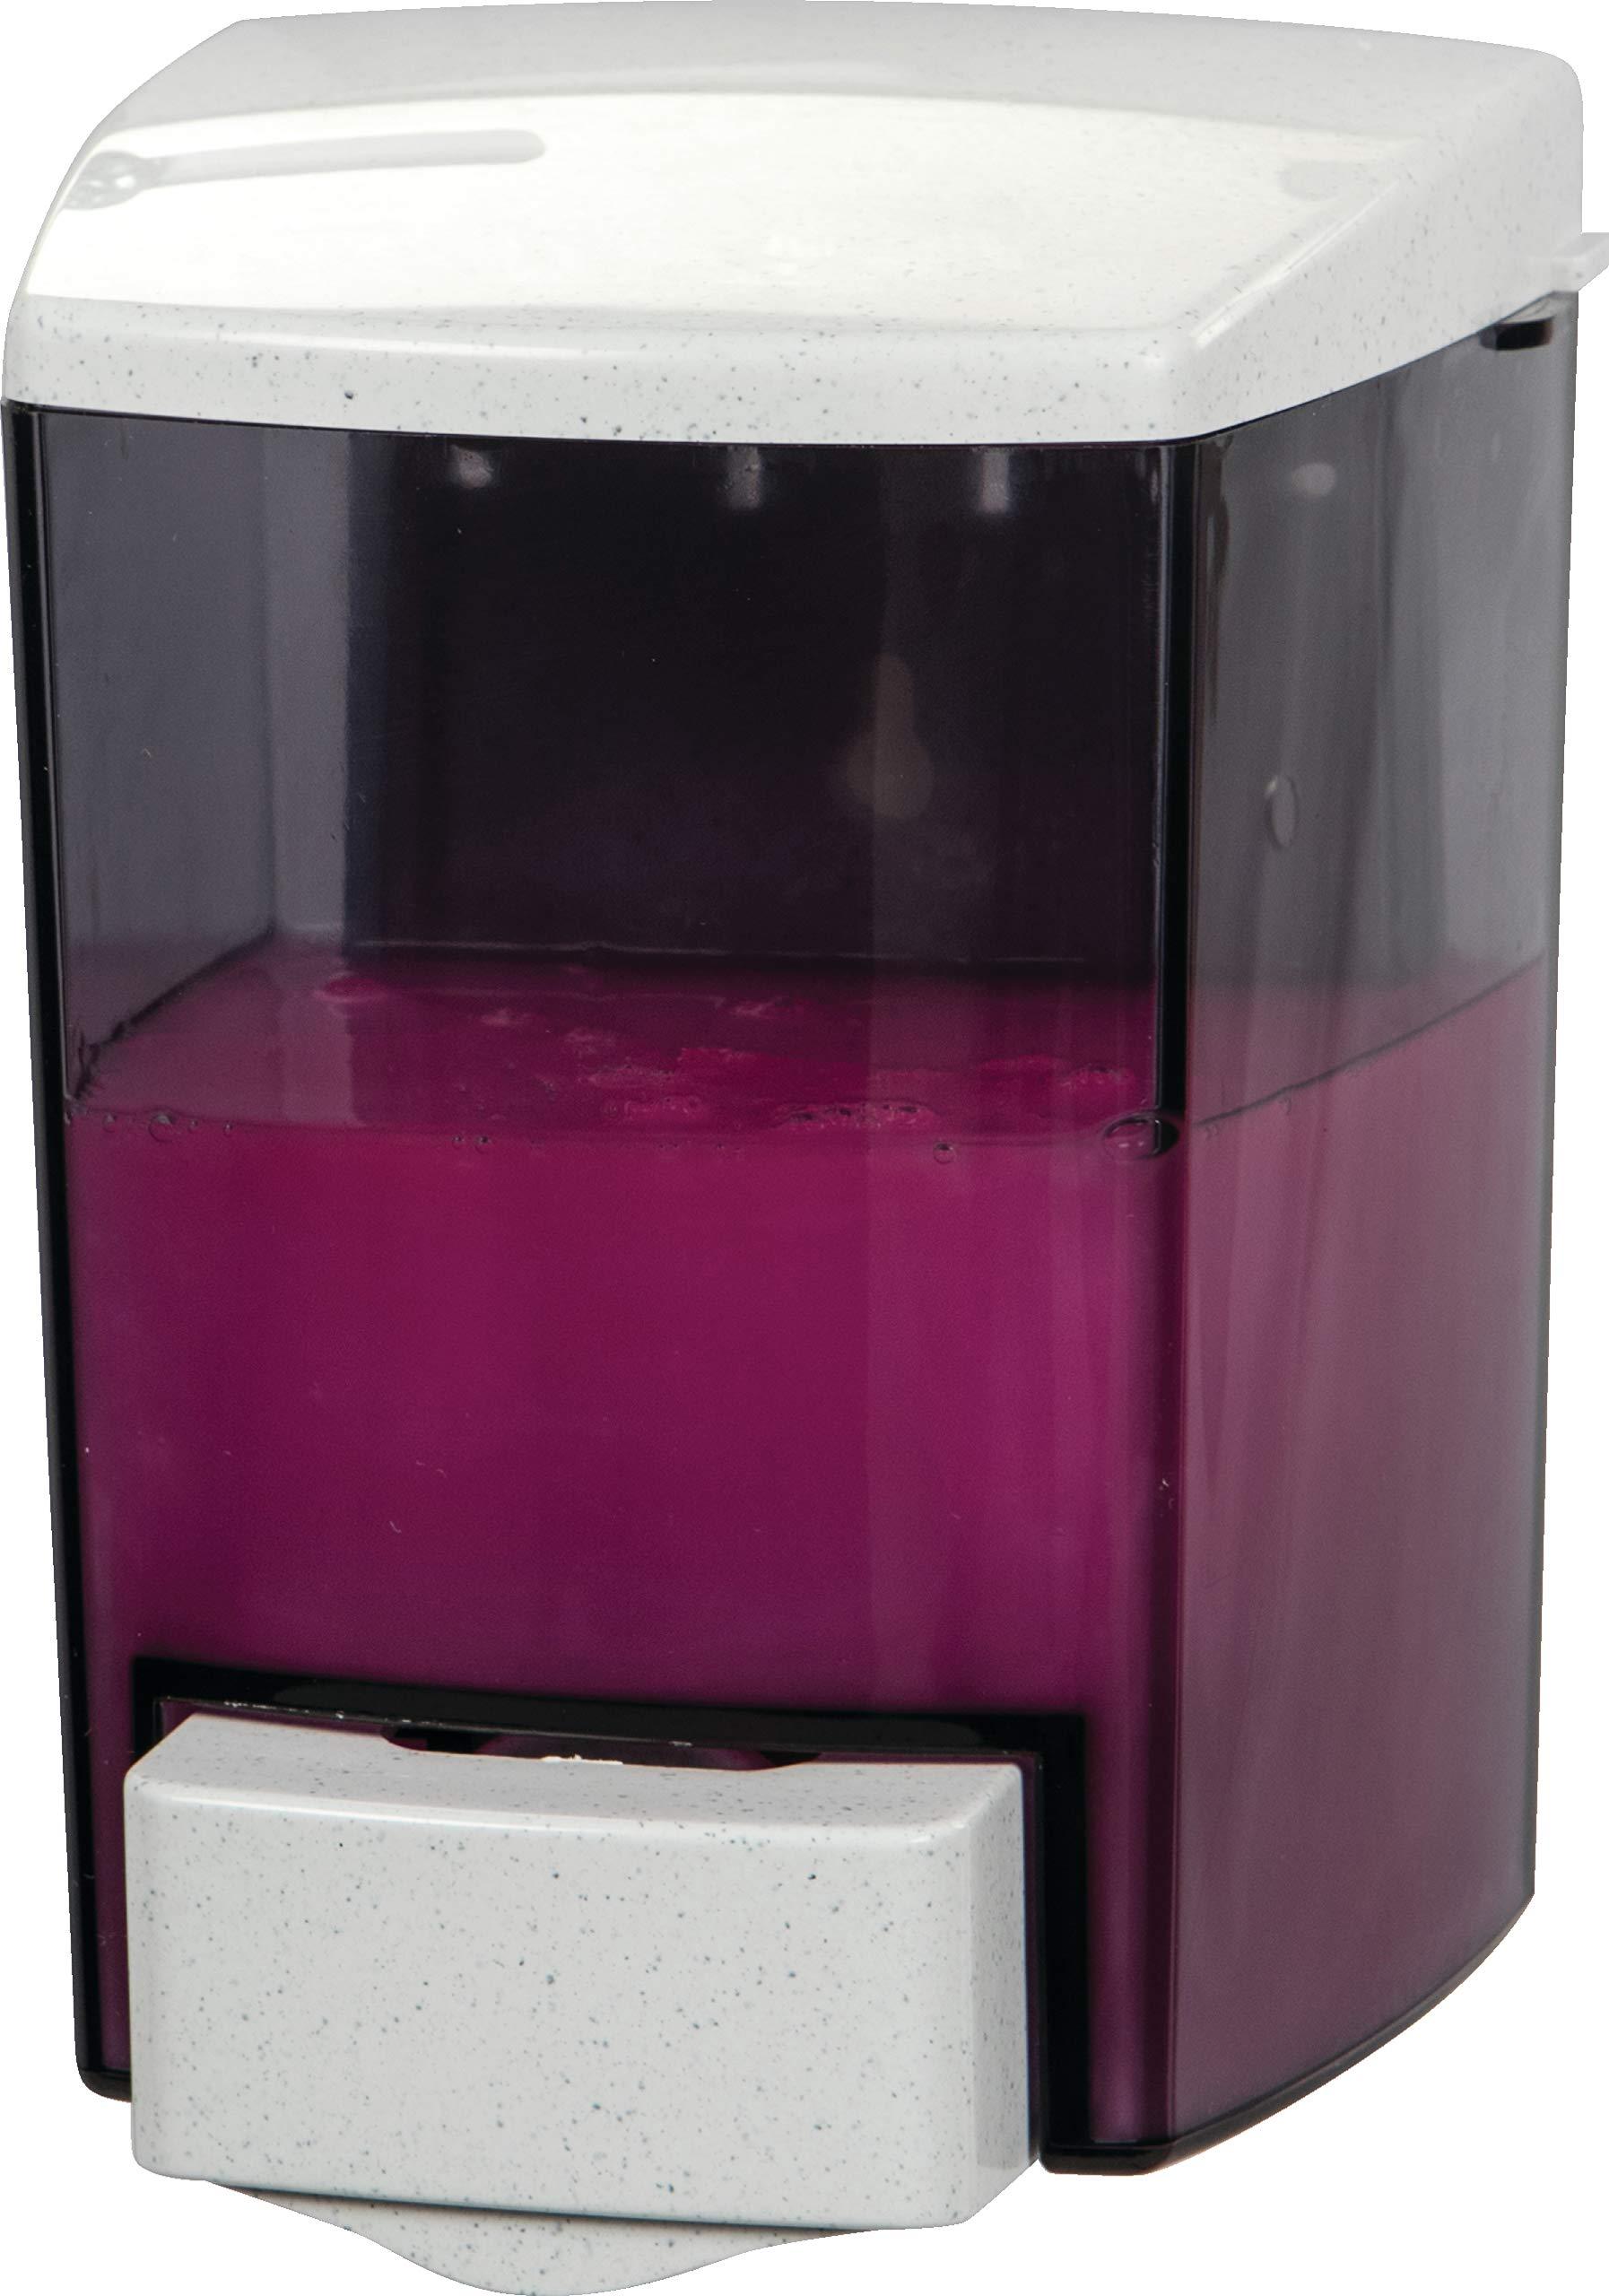 San Jamar S30TBK Bulk Liquid/Lotion Soap & Hand Sanitizer Dispenser, 30 oz. Capacity, Black by San Jamar